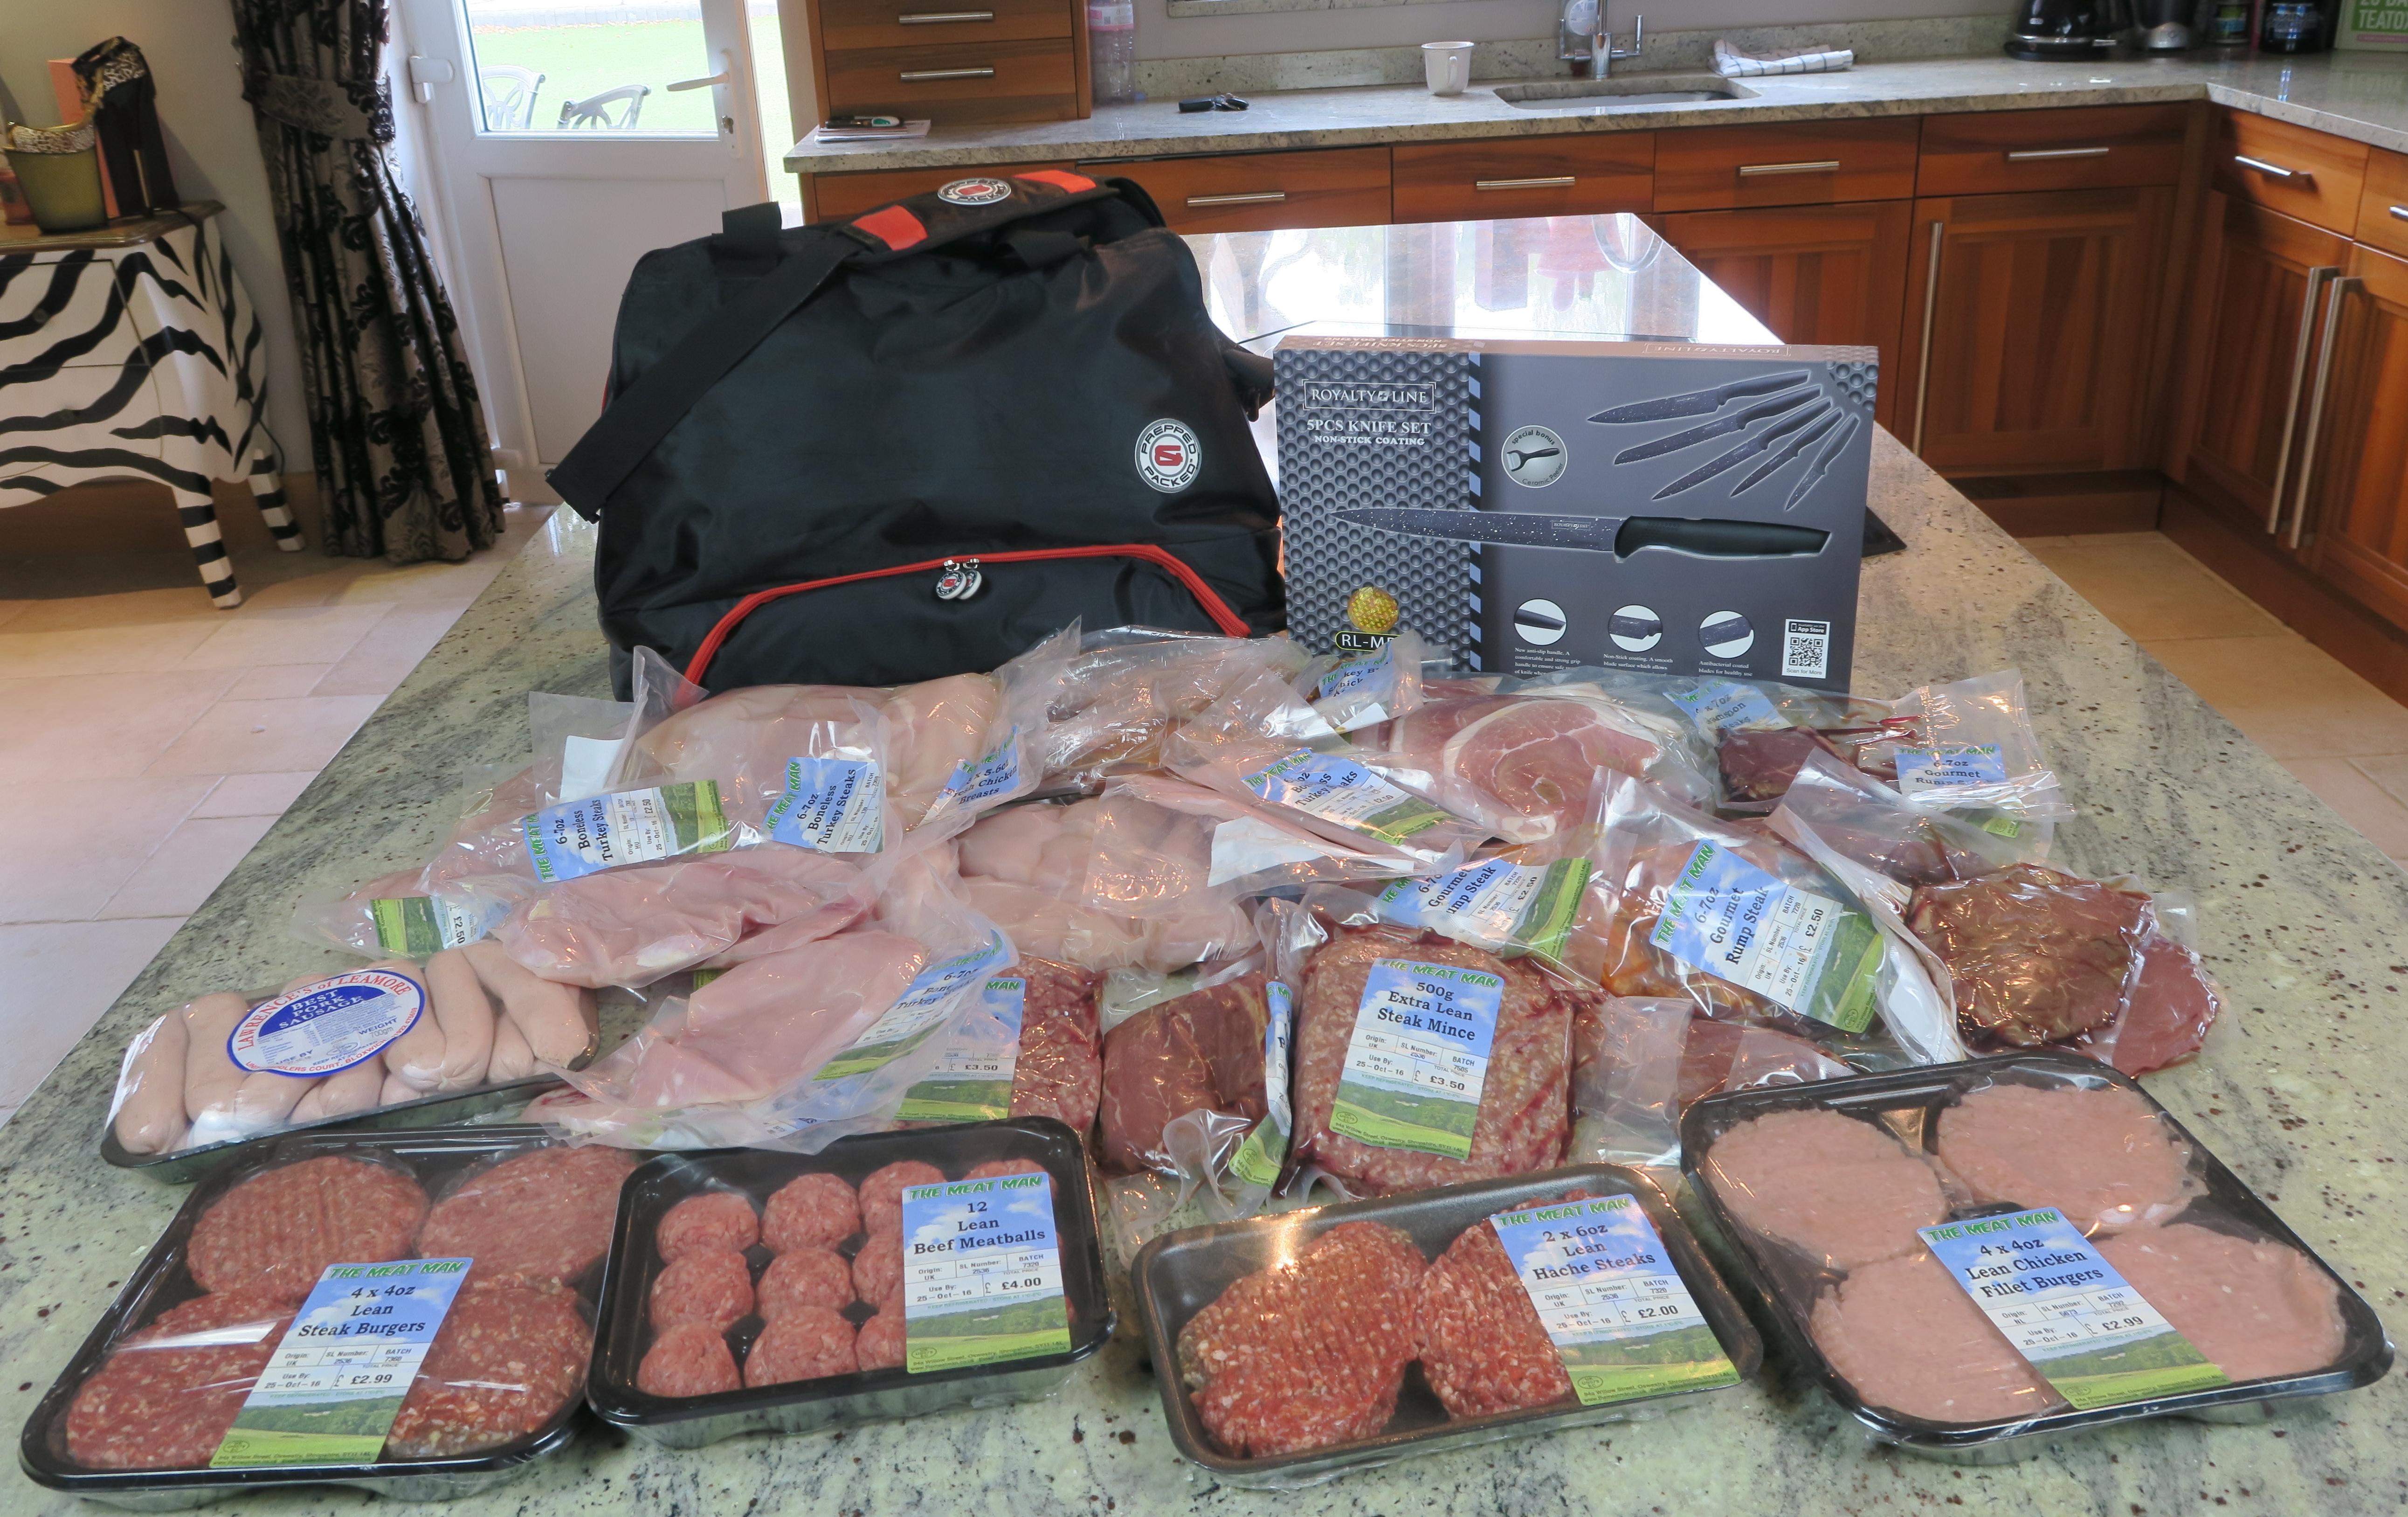 Prepped & Packed Meal Prep Hamper